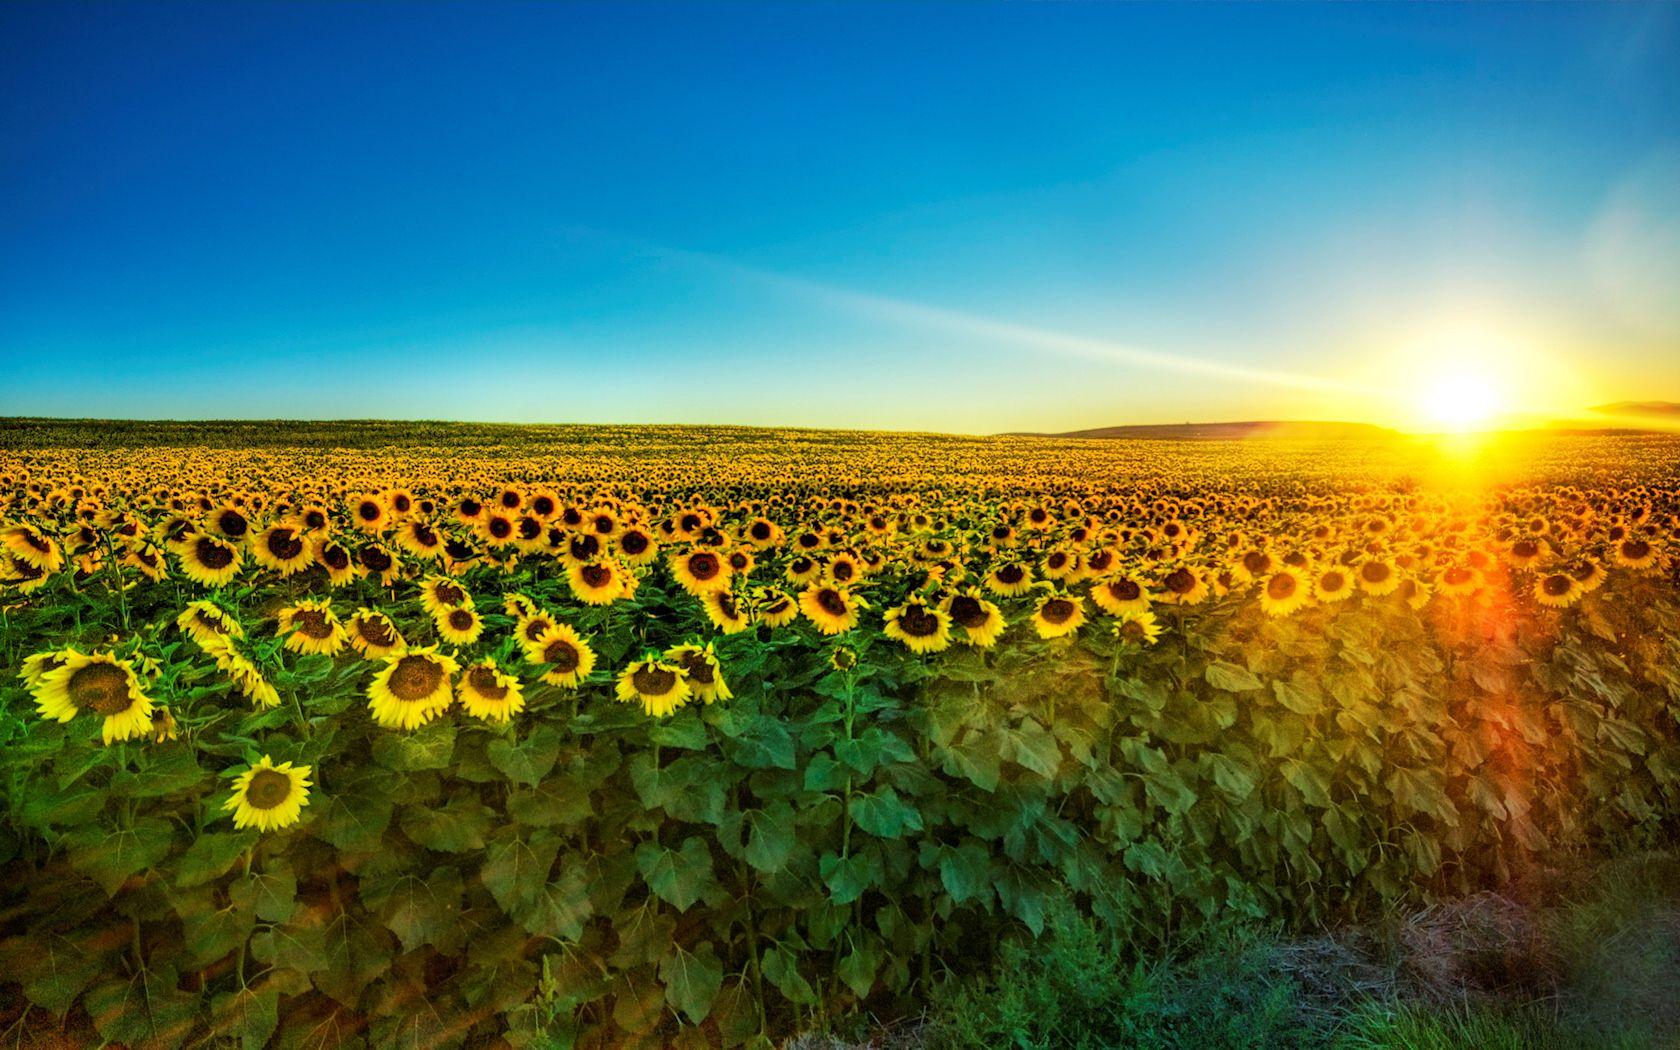 Sunflower Description Nature Sunflower Field Is A Hi Res Wallpaper For Pc Sunflower Wallpaper Sunflower Fields Hdr Photography